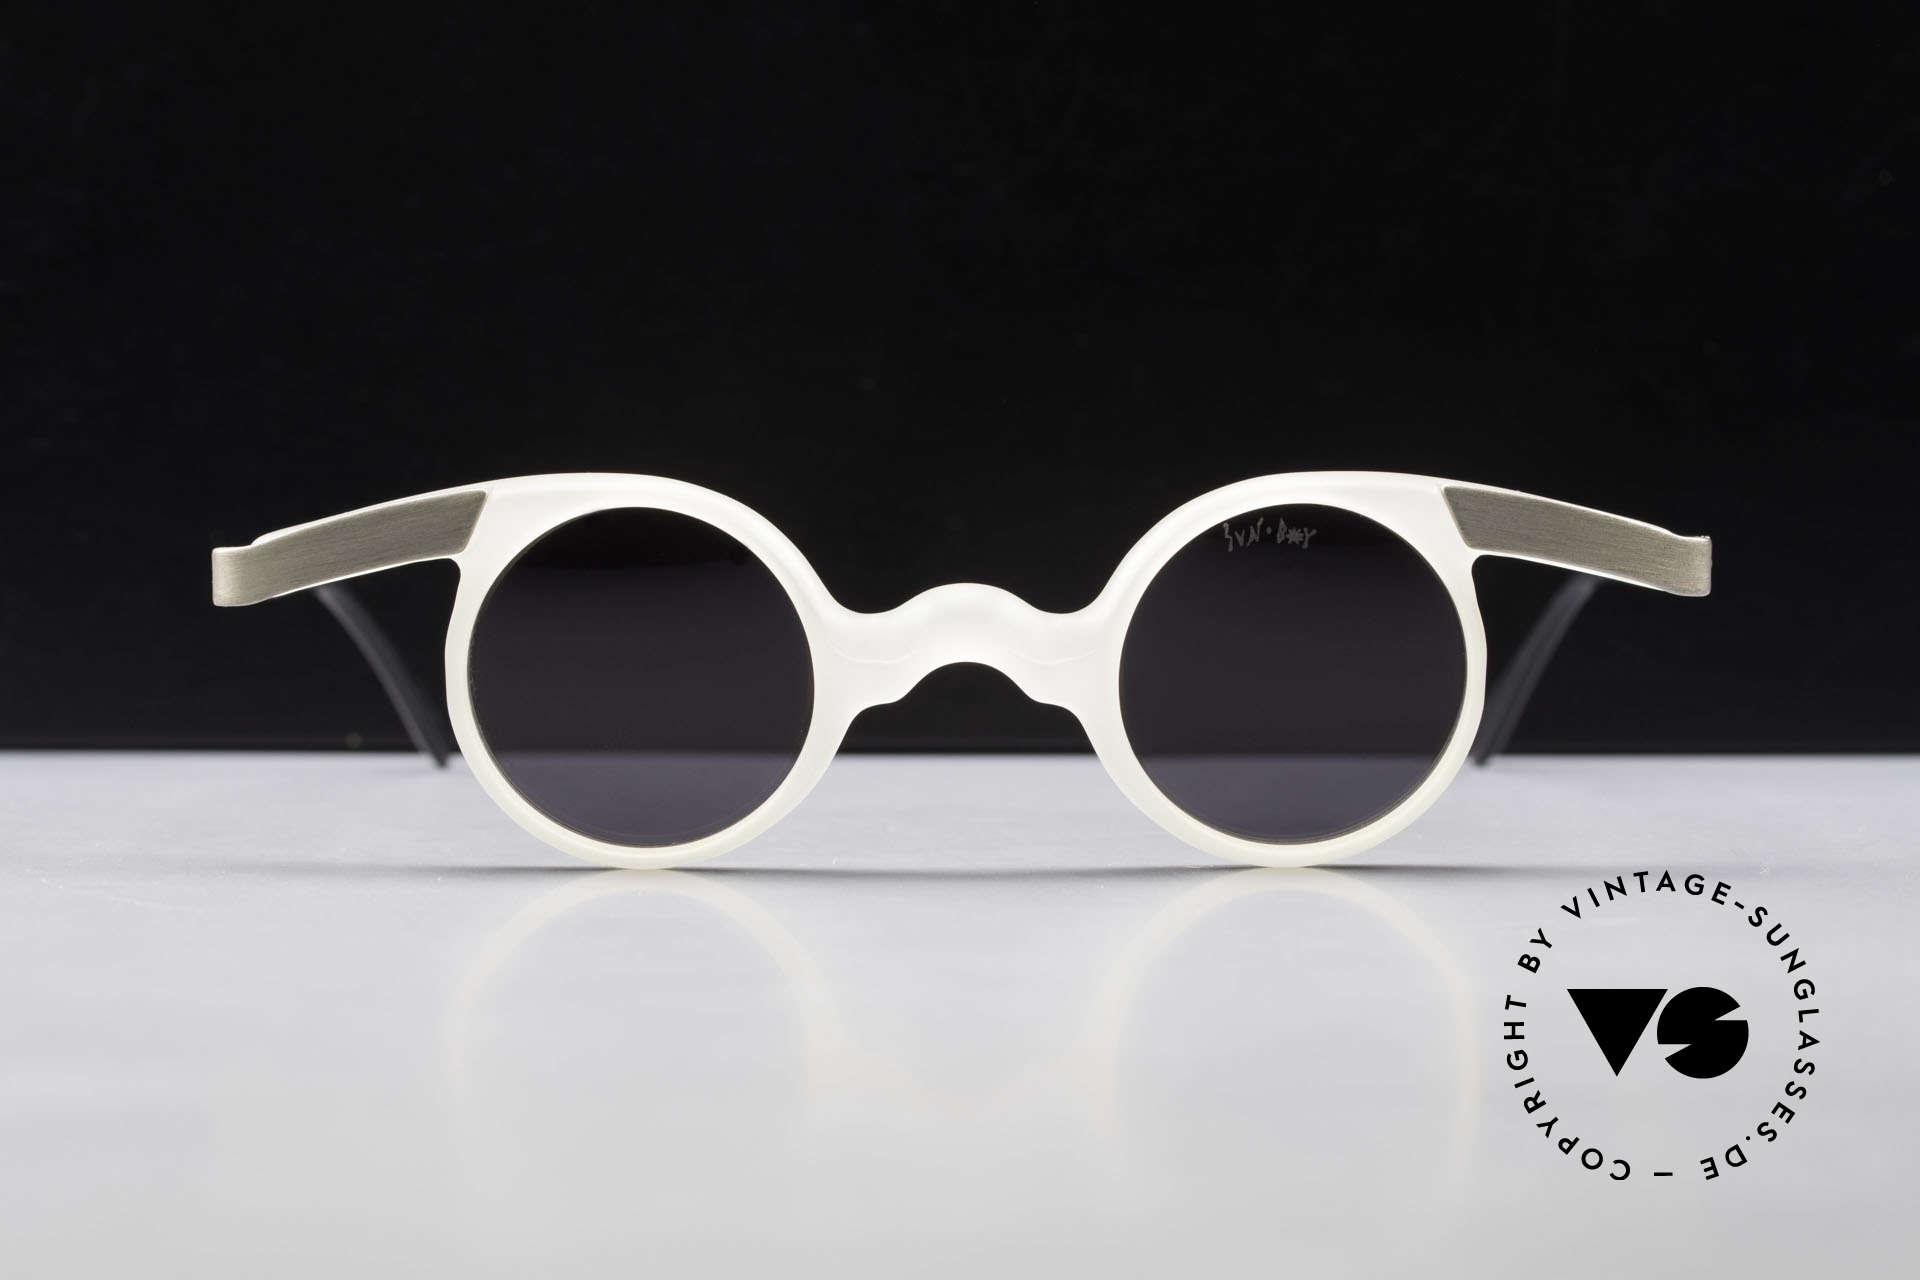 Sunboy SB39 Vintage No Retro Sunglasses, spectacular frame construction - a true eye-catcher, Made for Men and Women